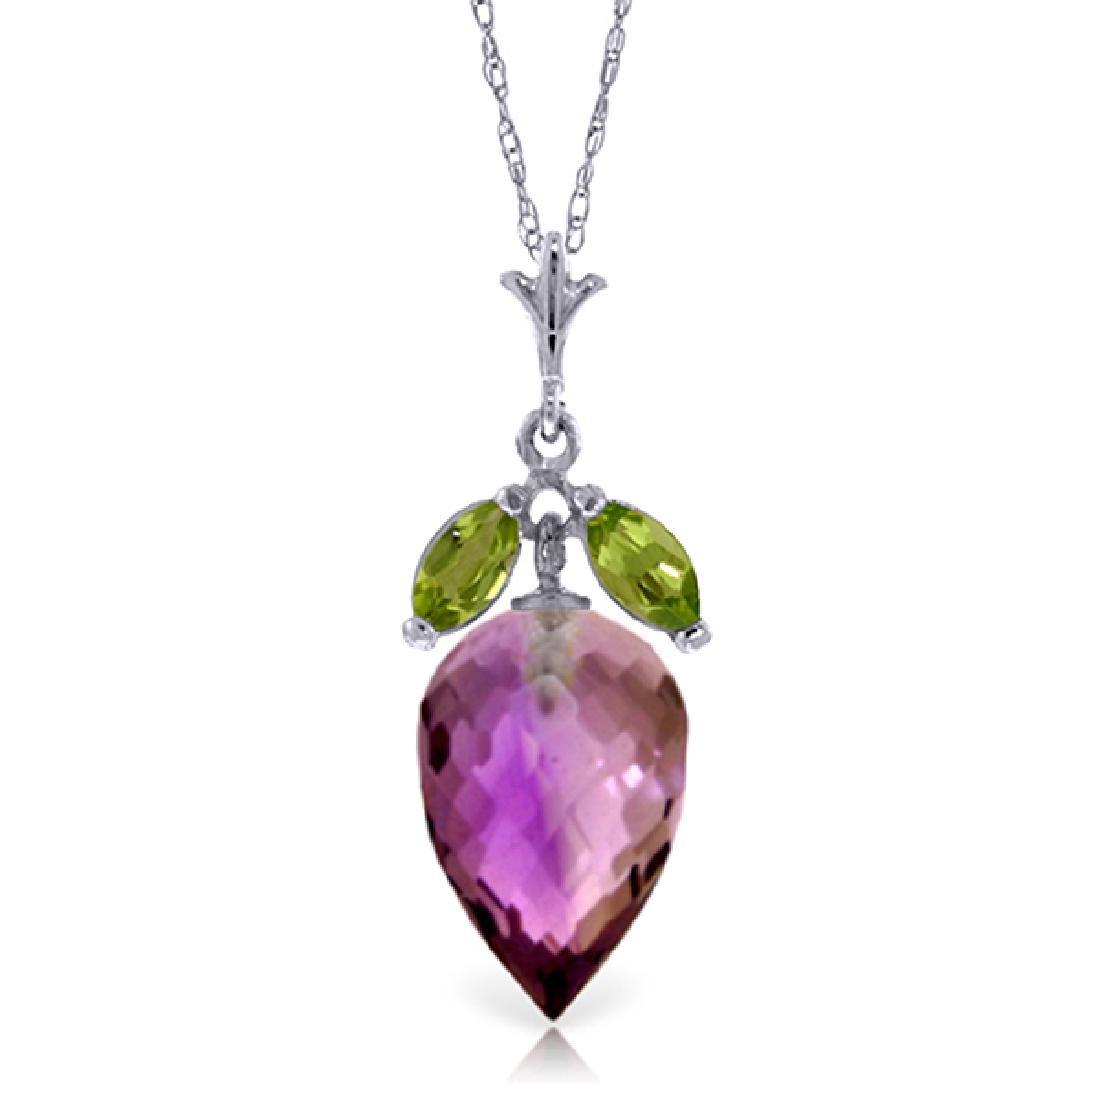 Genuine 10 ctw Amethyst & Peridot Necklace Jewelry 14KT